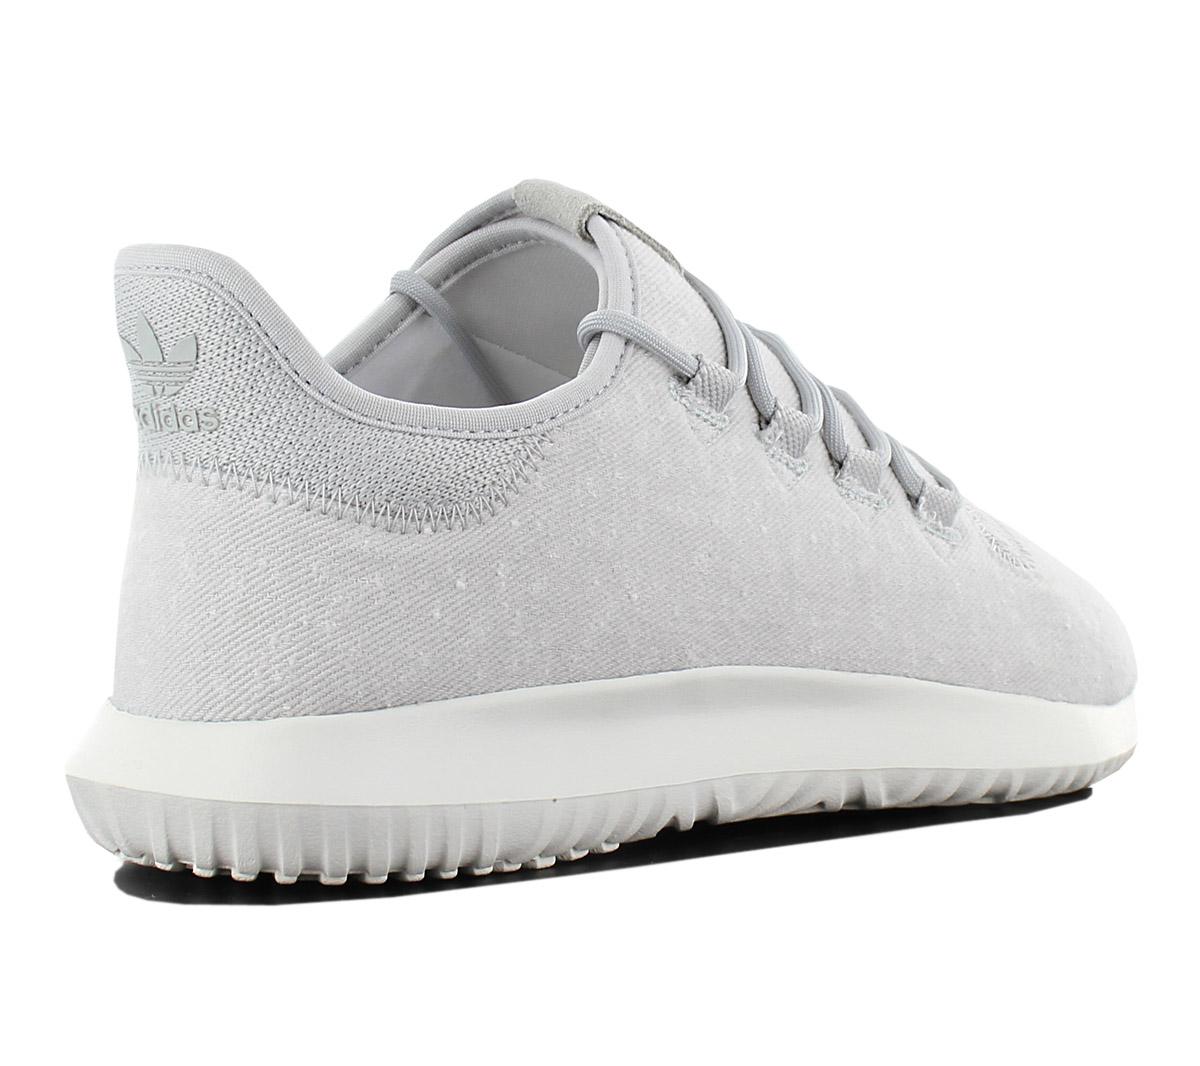 84261f336e9ab9 Adidas Originals Tubular Shadow Men s Sneakers Shoes Zapatillas ...